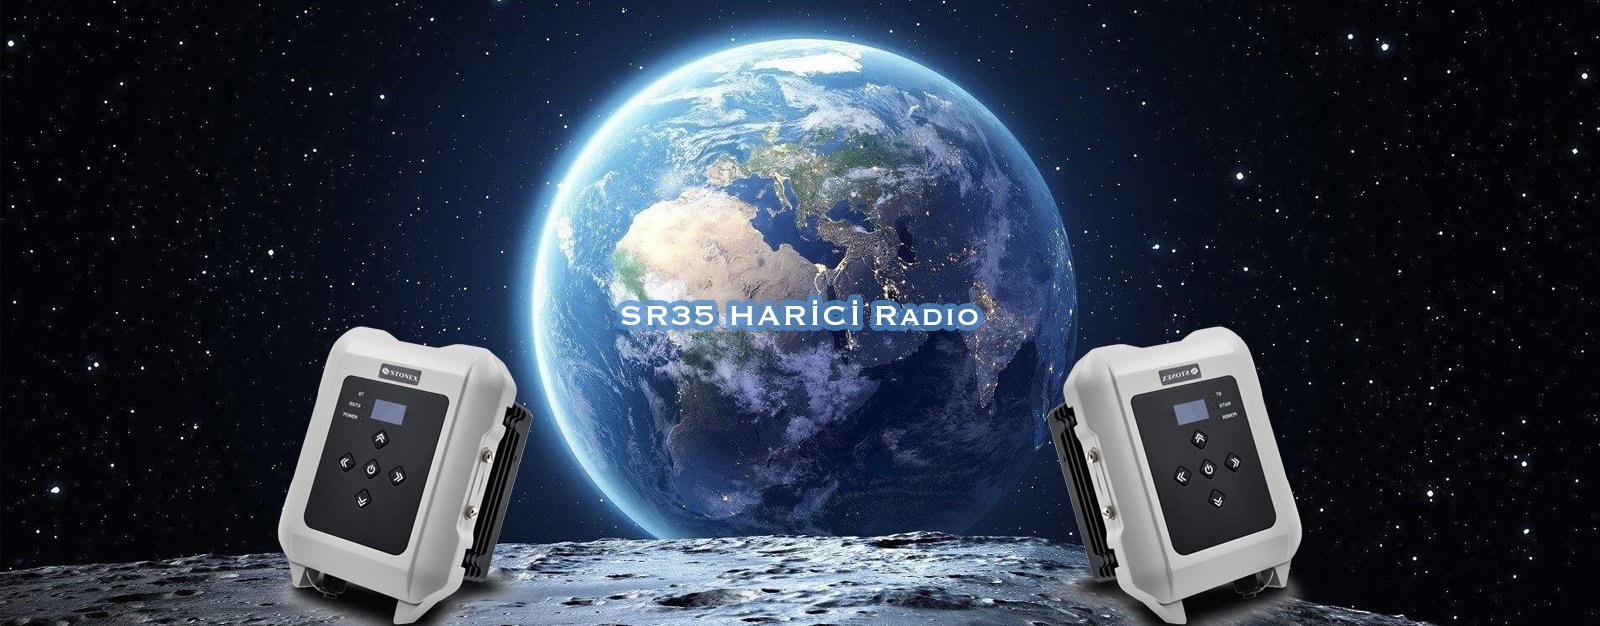 SR35-HARICI-RADIO